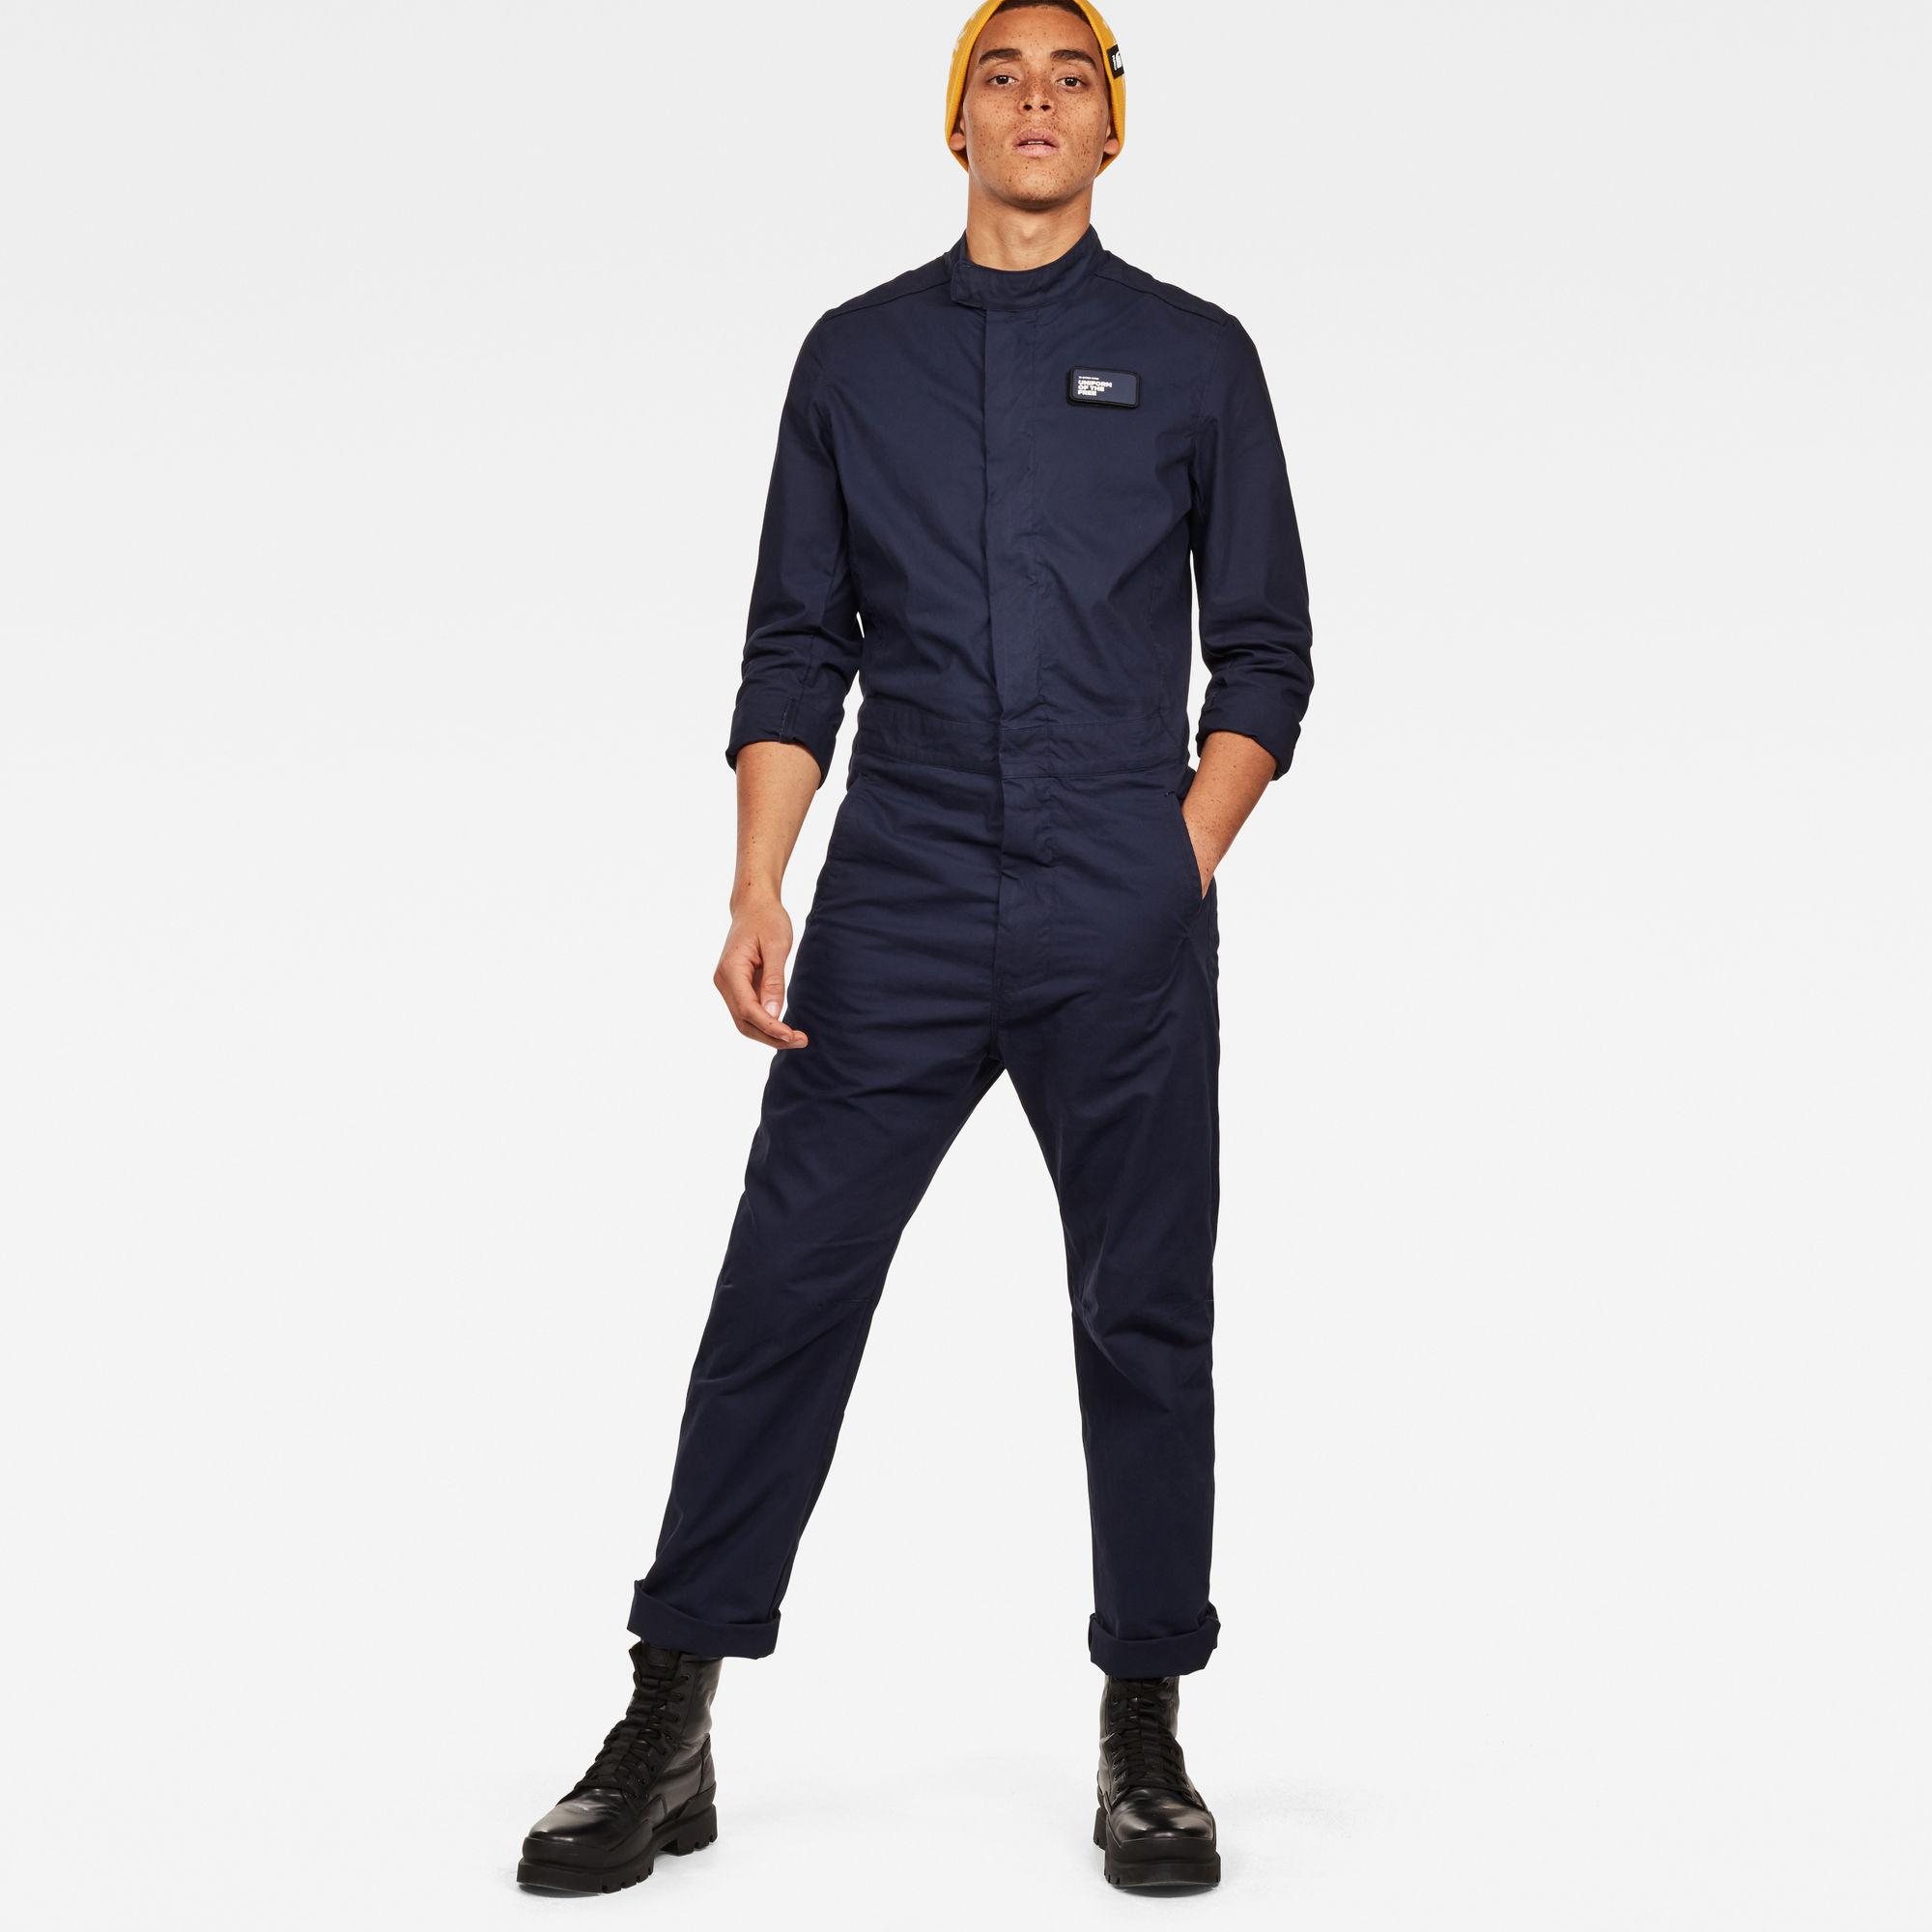 Image of G Star Raw Avernus Racer Suit Slim